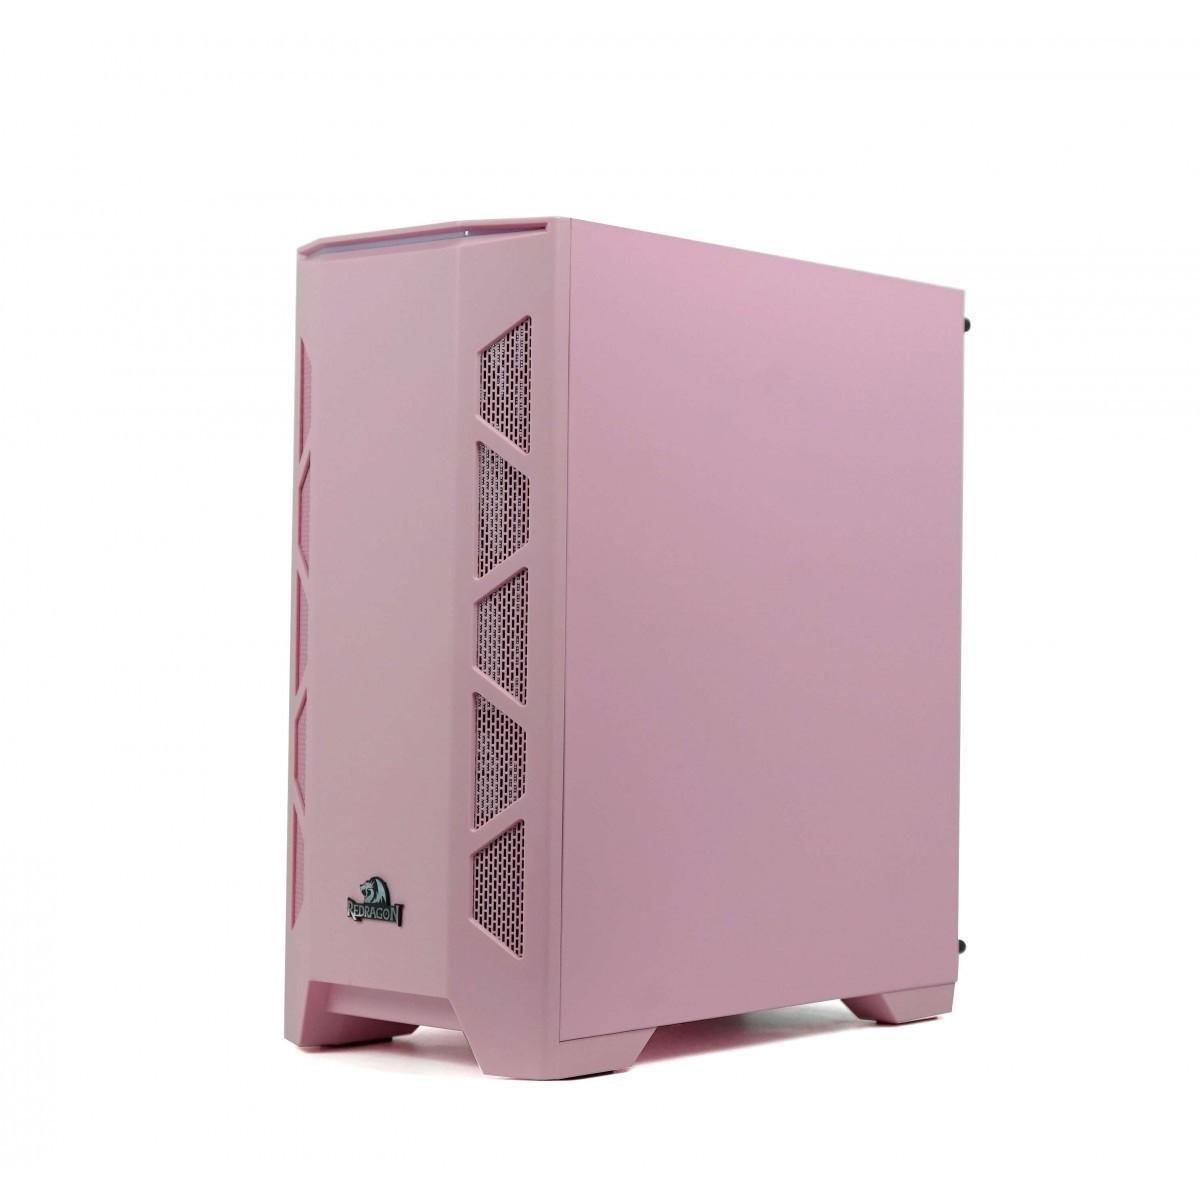 Gabinete Gamer Redragon Starscream, Mid Tower, Vidro Temperado, Pink, Sem Fonte e Fan - GC-610P